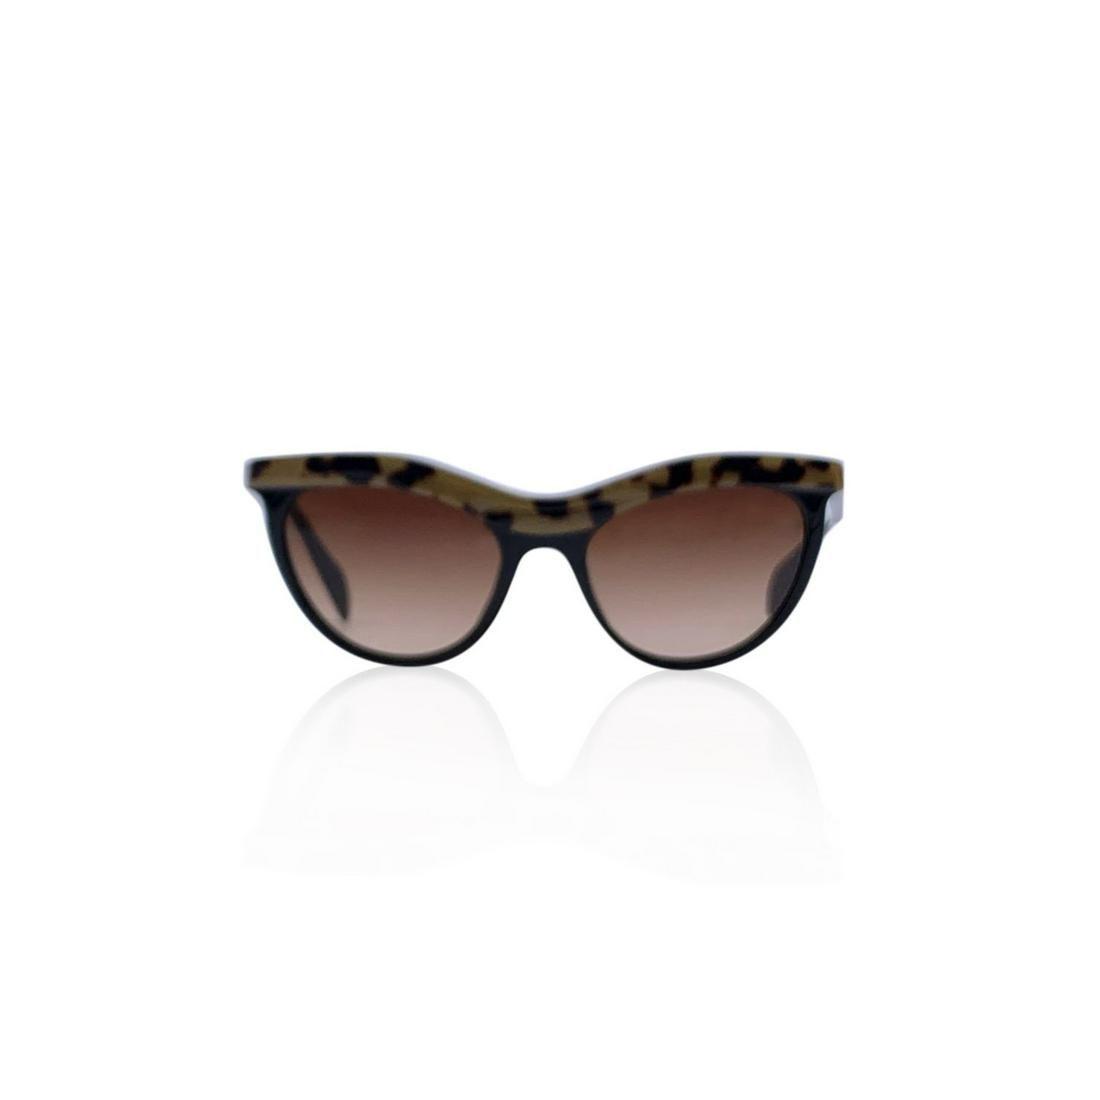 Prada Black Cat Eye SPR06P Sunglasses 54/19 140mm